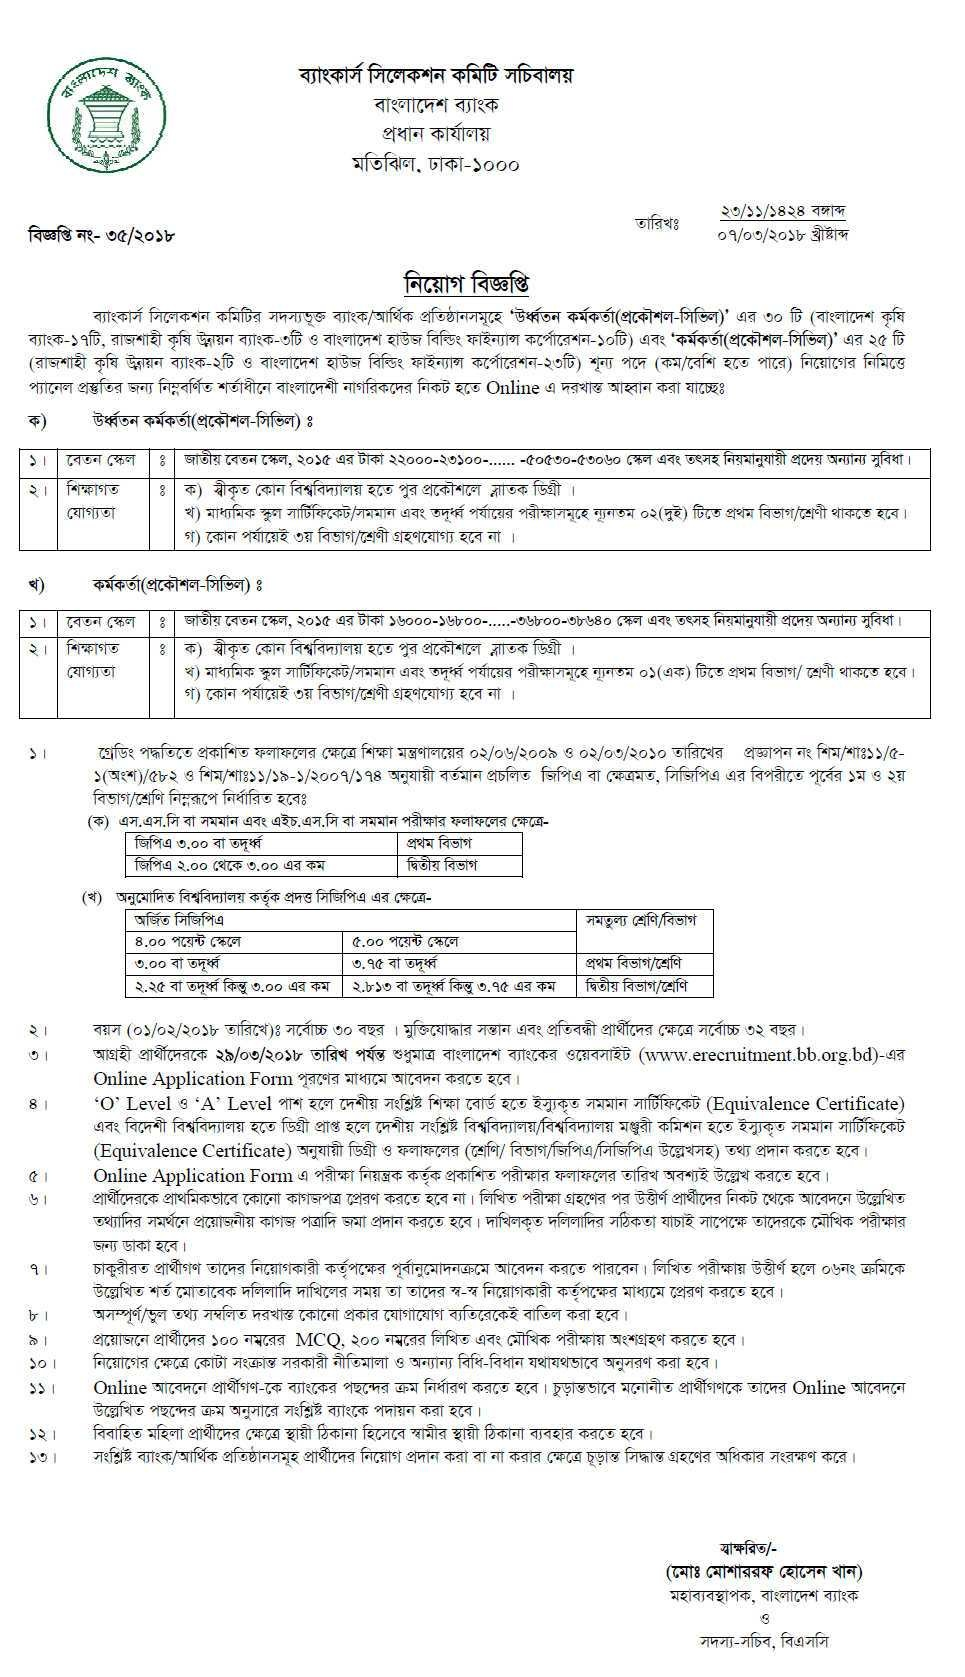 Bangladesh Krishi Bank Job Circular 2018